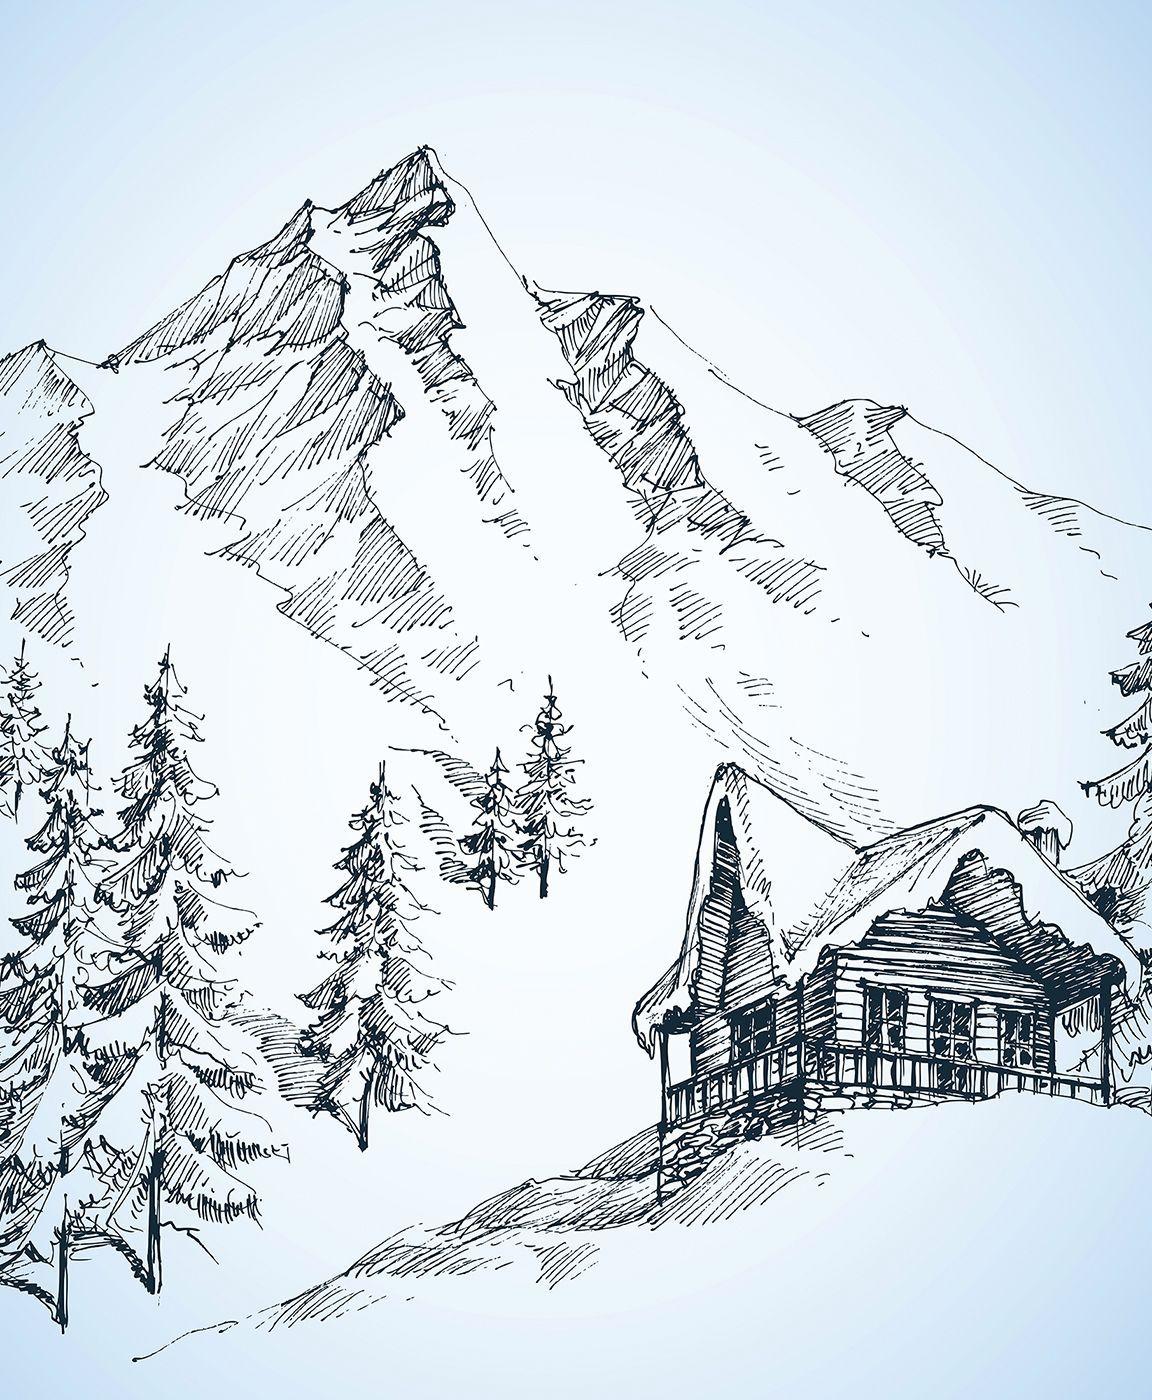 Mountain Landscape Sketch Landscape Pencil Drawings Mountain Sketch